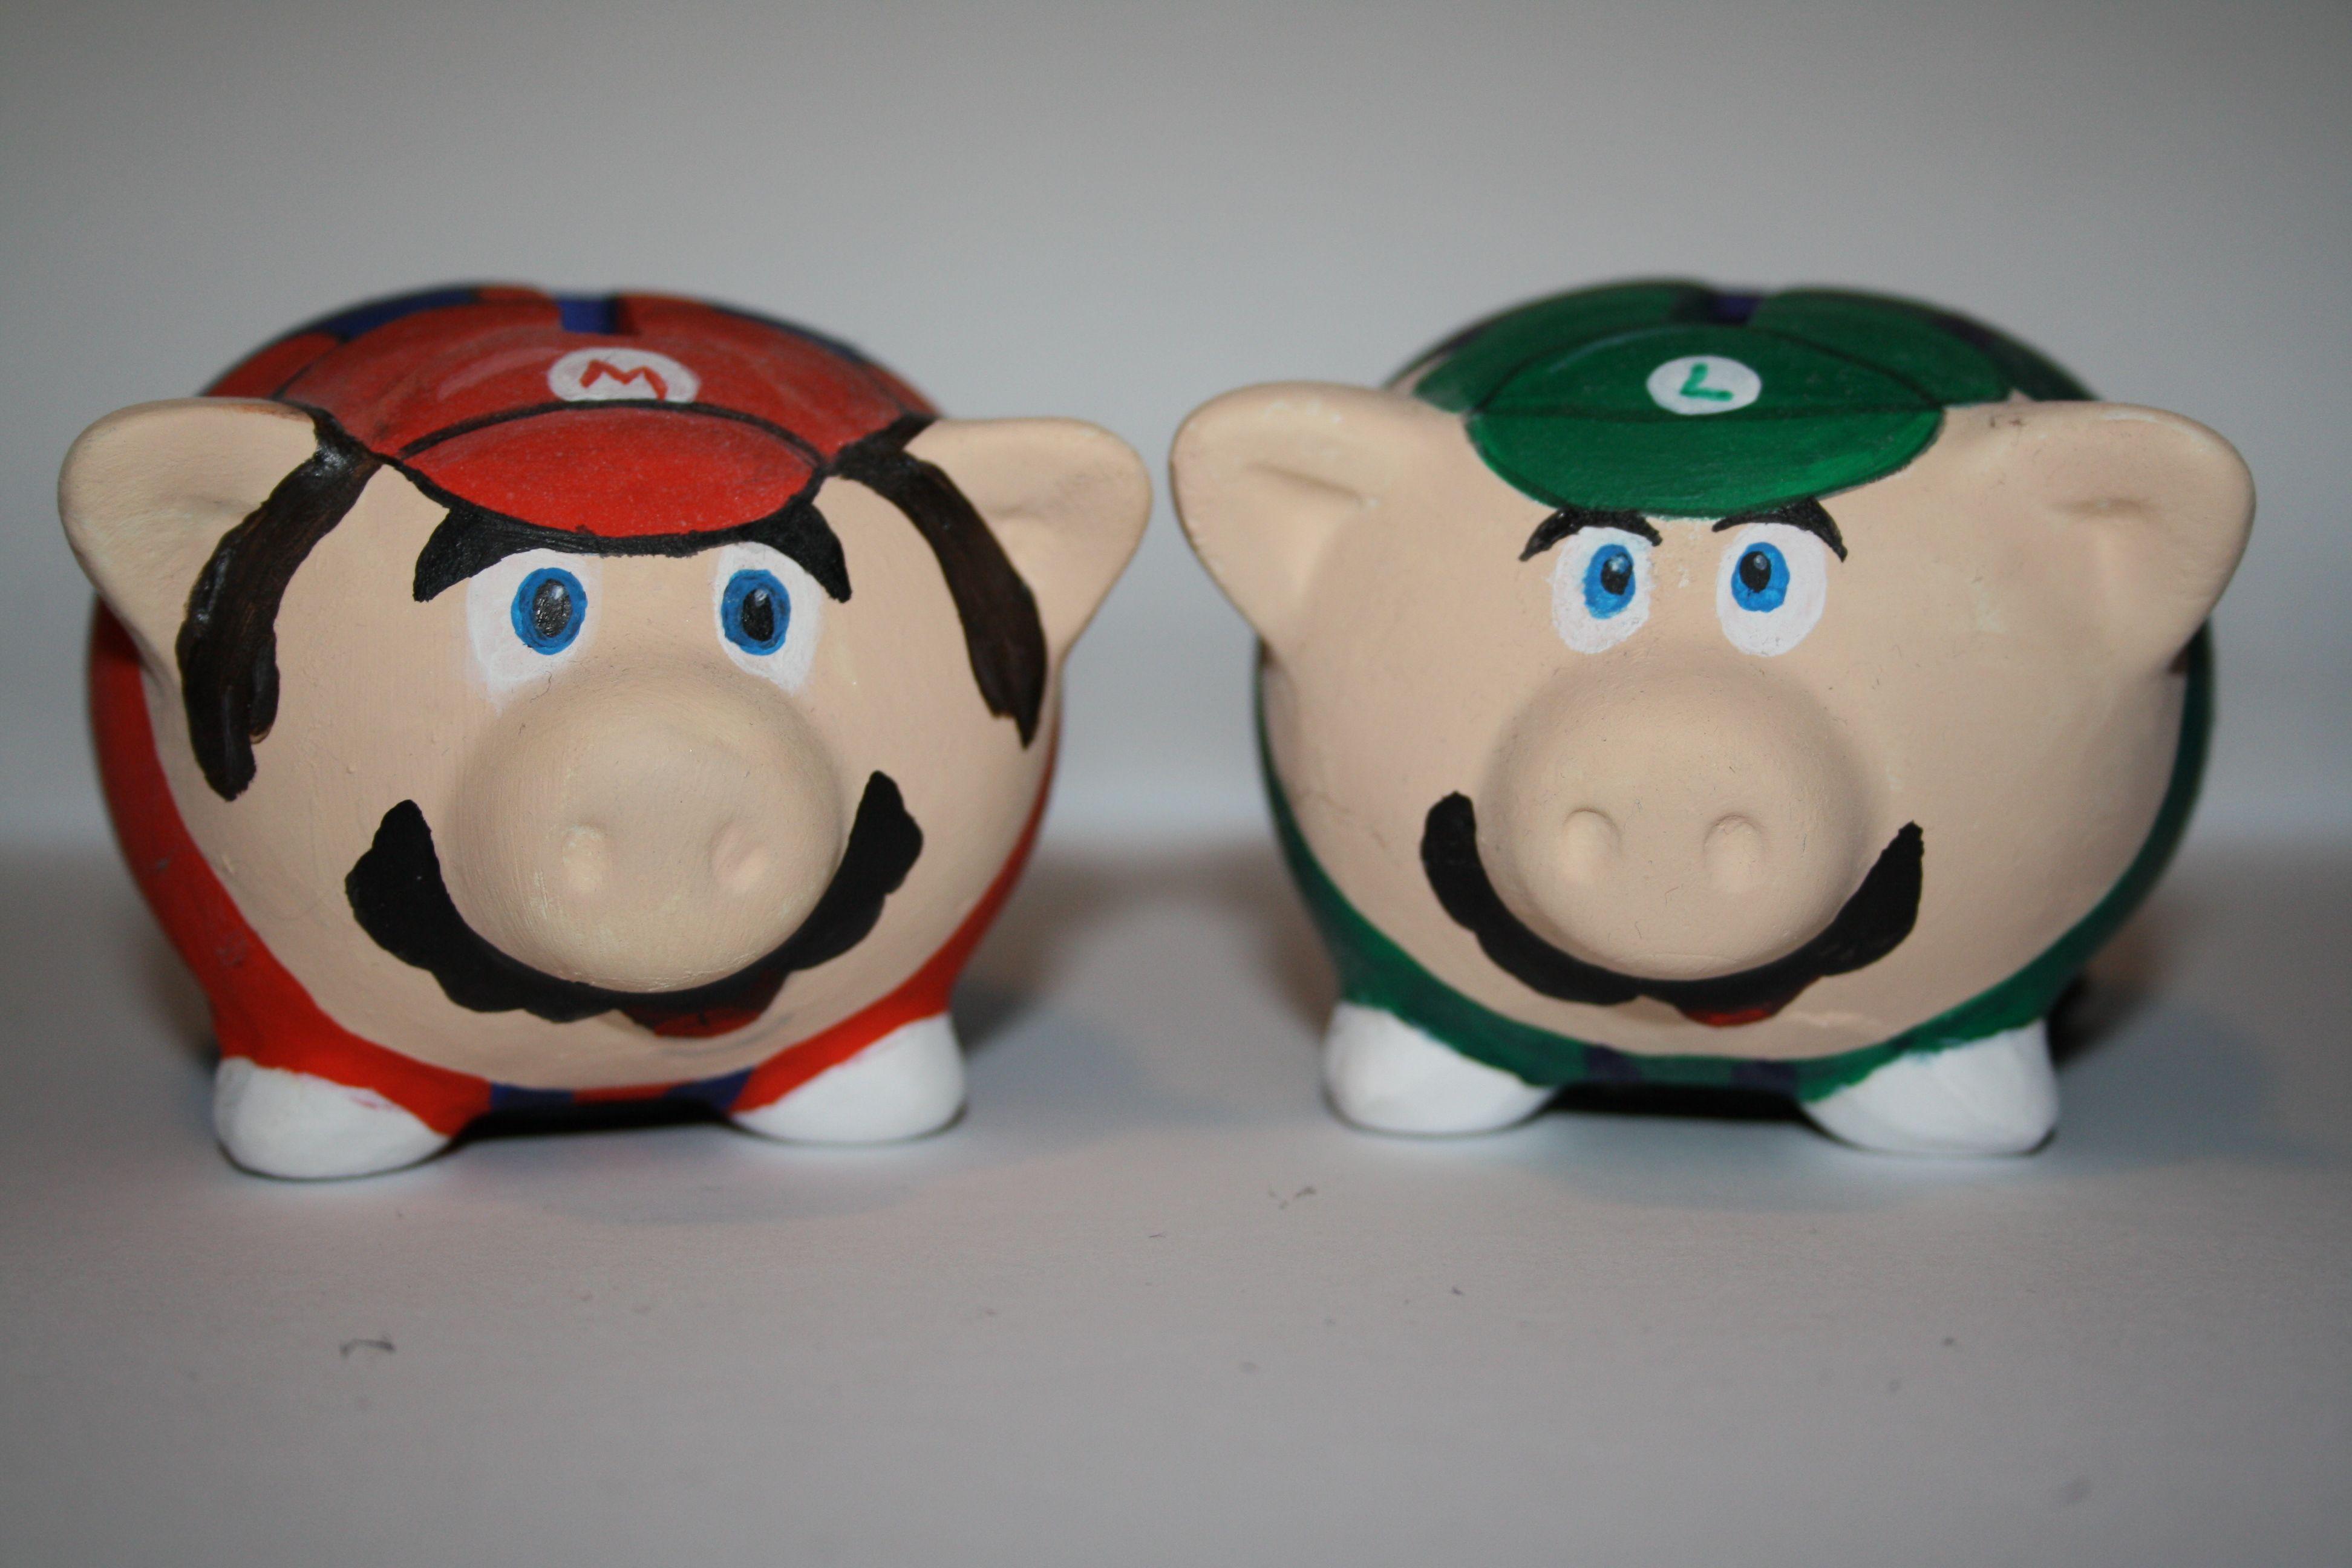 Cheap DIY painted piggy banks- Mario, Luigi, Link, Van Gogh